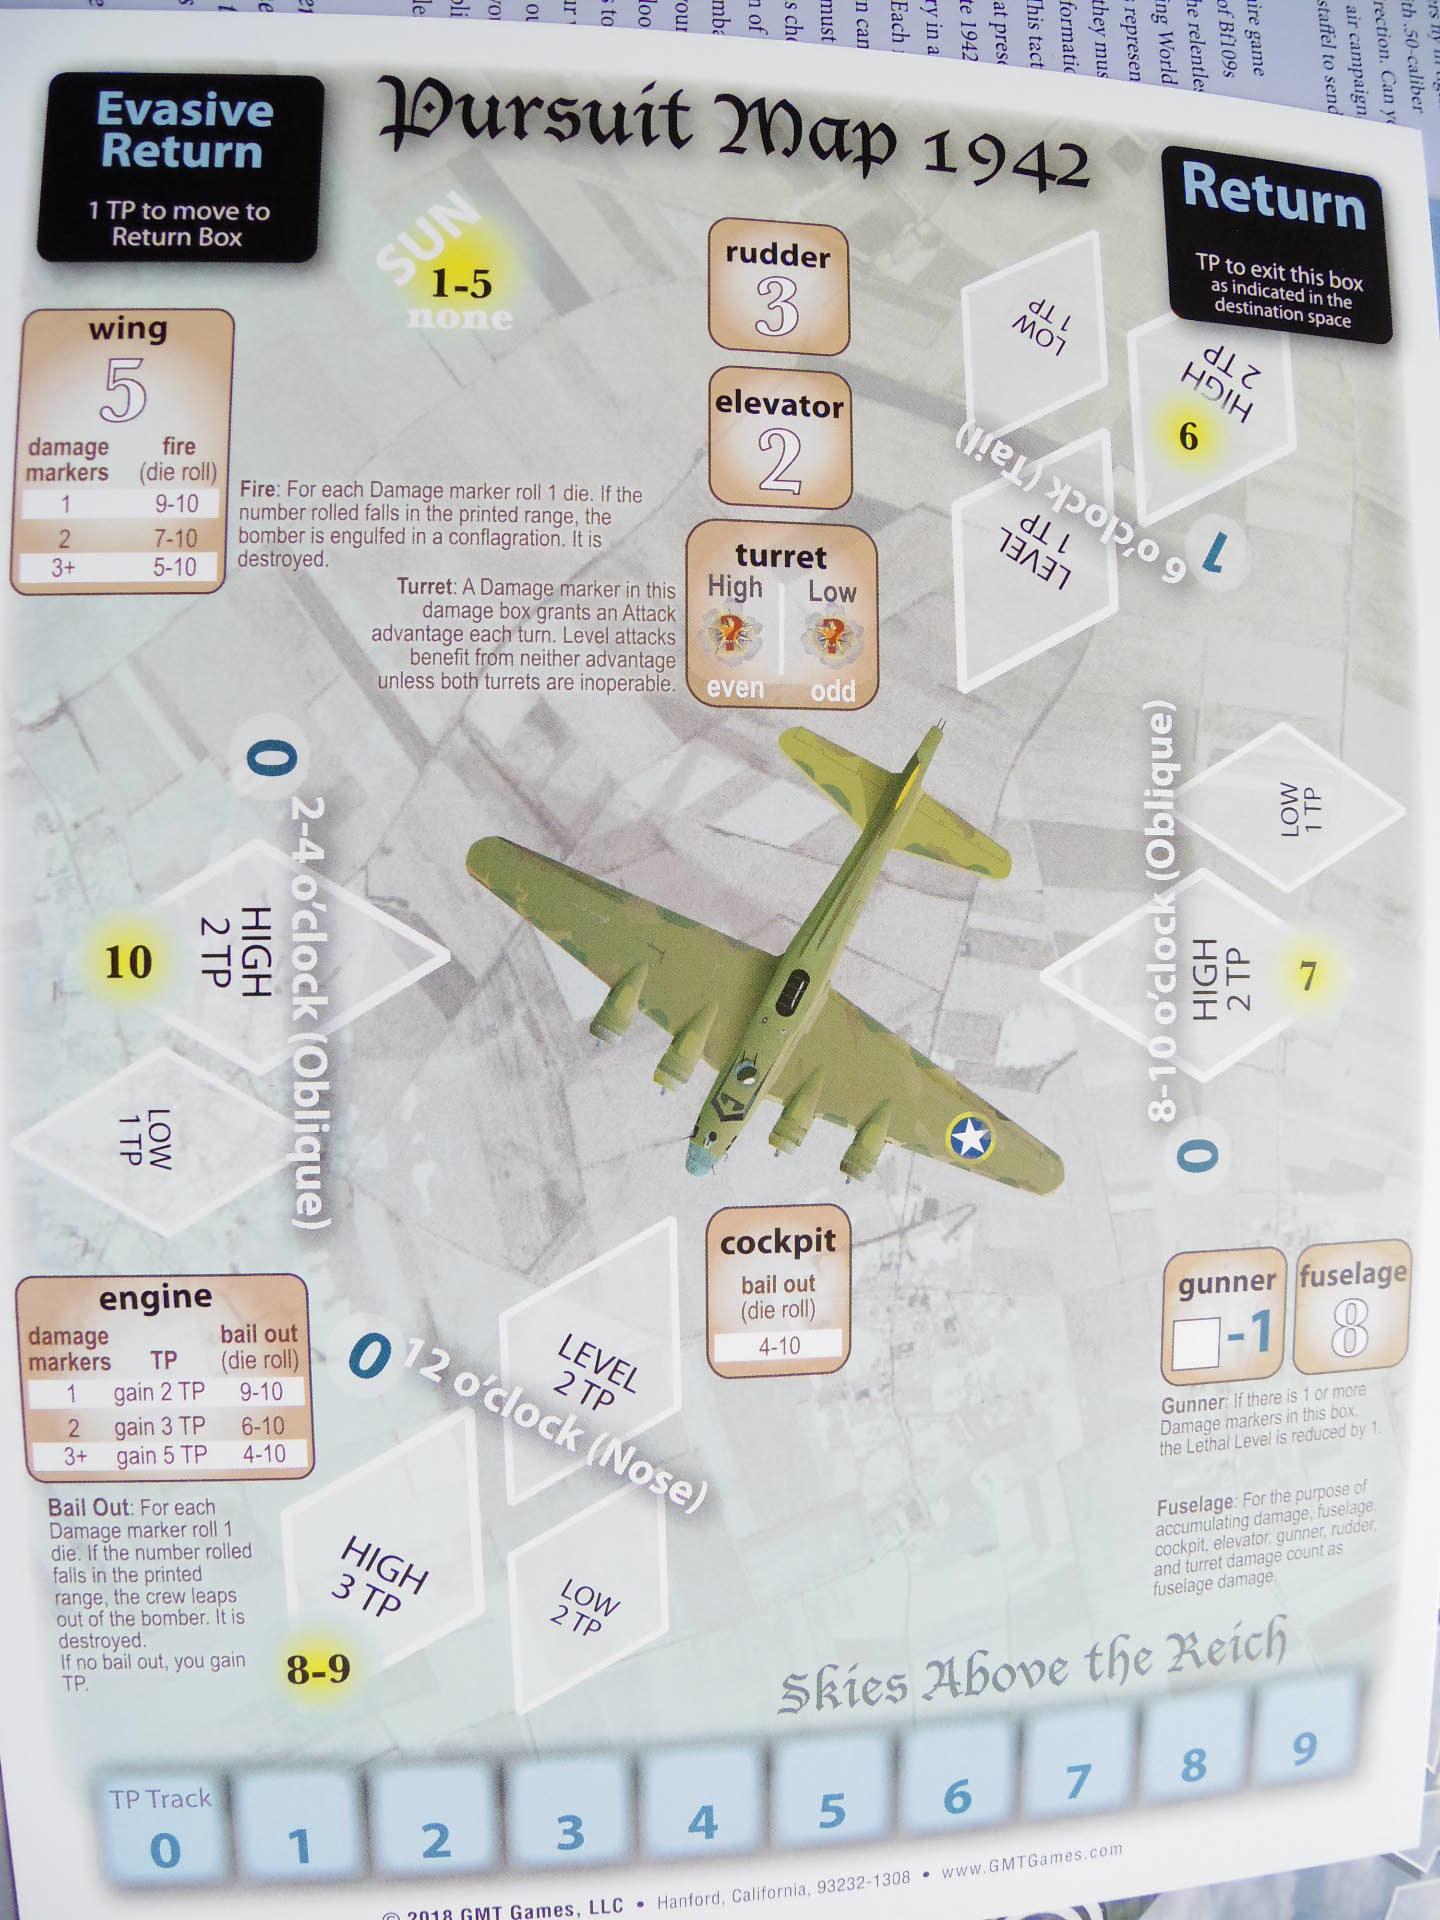 (GMT)Skies Above the Reich ドイツ本土昼間防空戦(ソロ専用)...かつてのウォーゲーム・ブーム期を上回る勢いで続々と出版される最新ゲームたち➁_b0173672_22210711.jpg